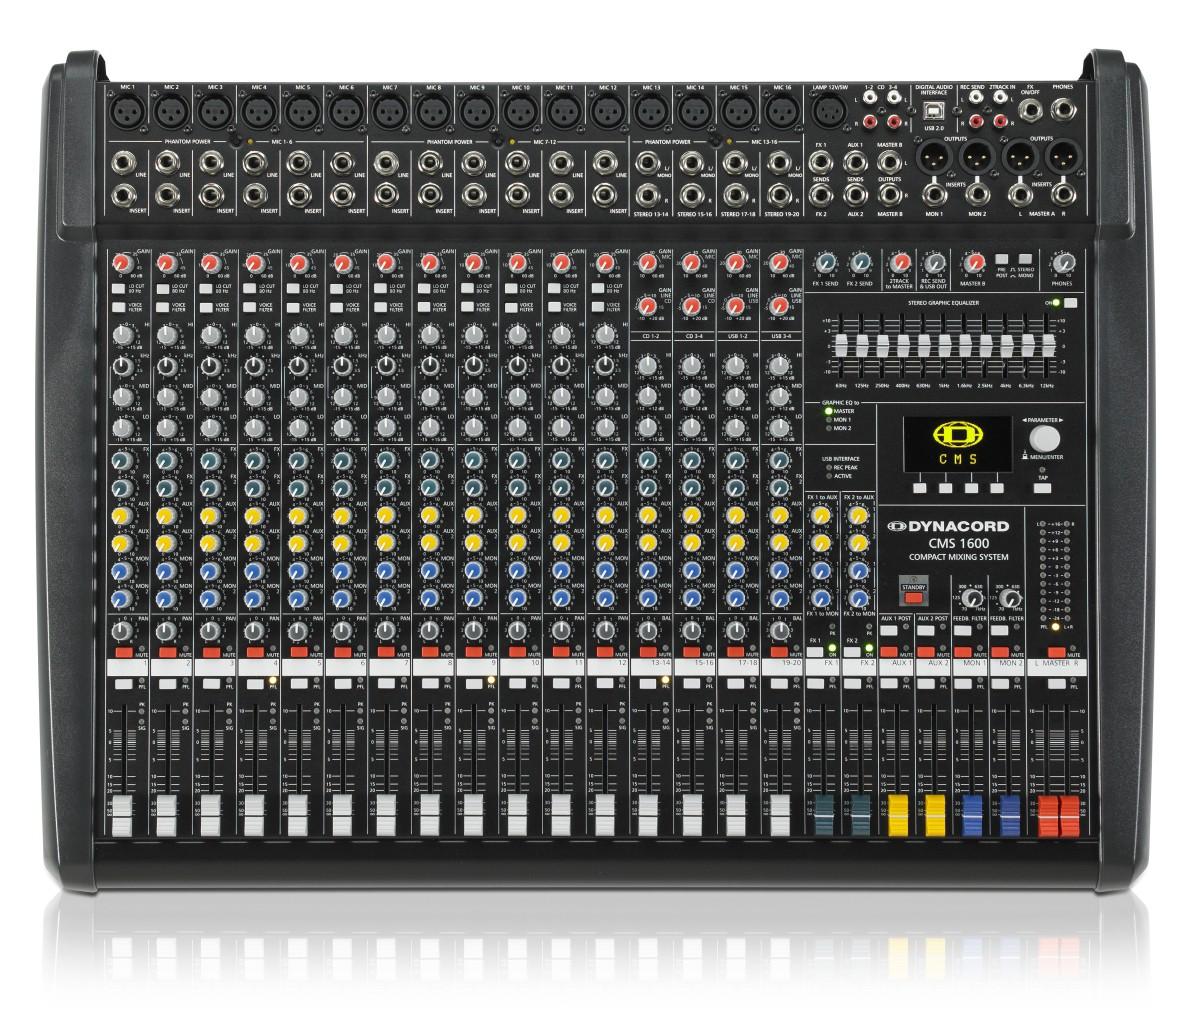 Dynacord CMS 1600 MK3 16 Kanal Kompaktmixer